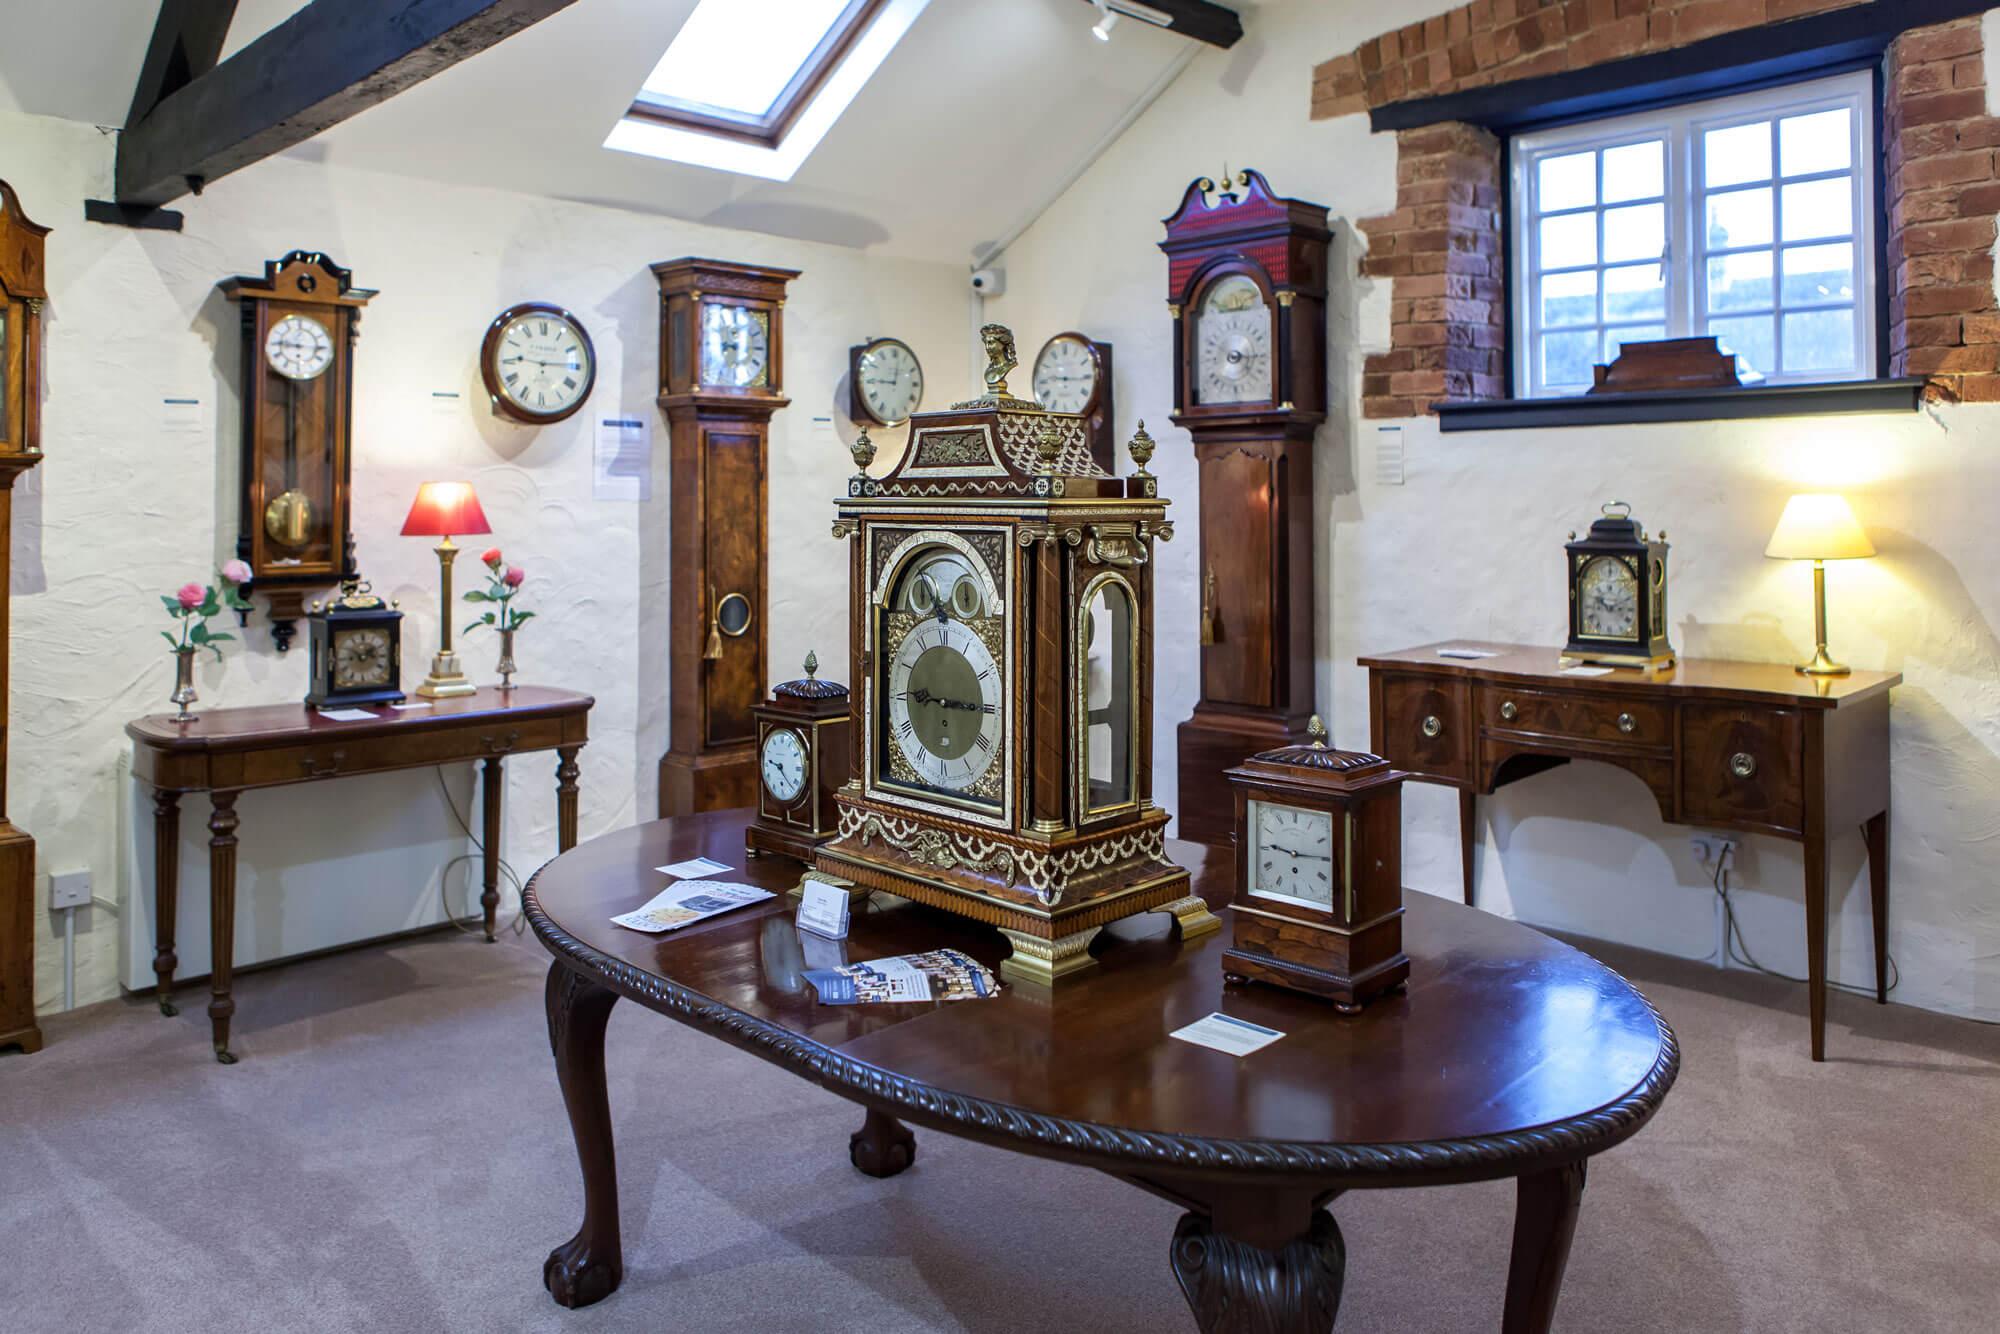 Miraculous Sales Repair Restoration Of Fine Antique Clocks The Download Free Architecture Designs Intelgarnamadebymaigaardcom